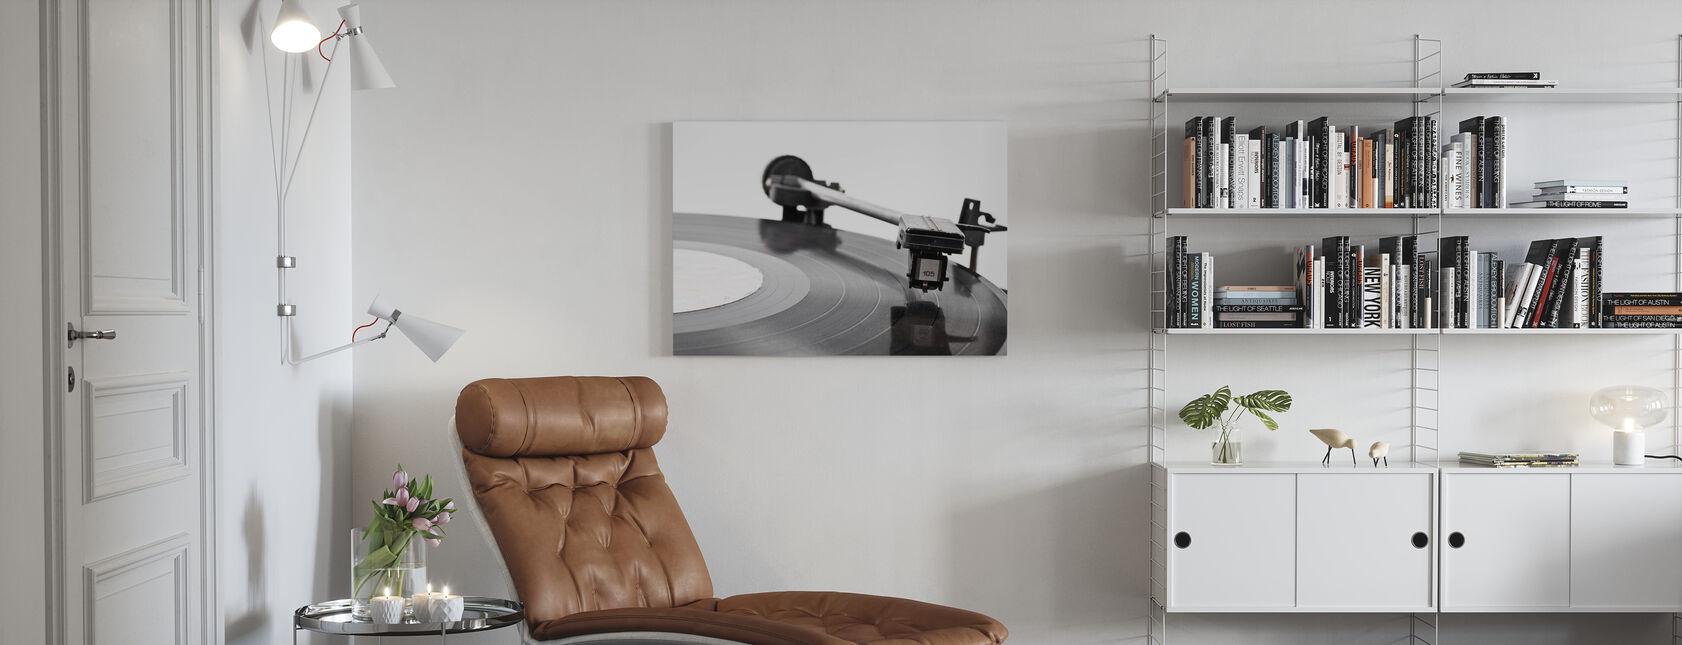 Old Vinyl Player - Canvas print - Living Room